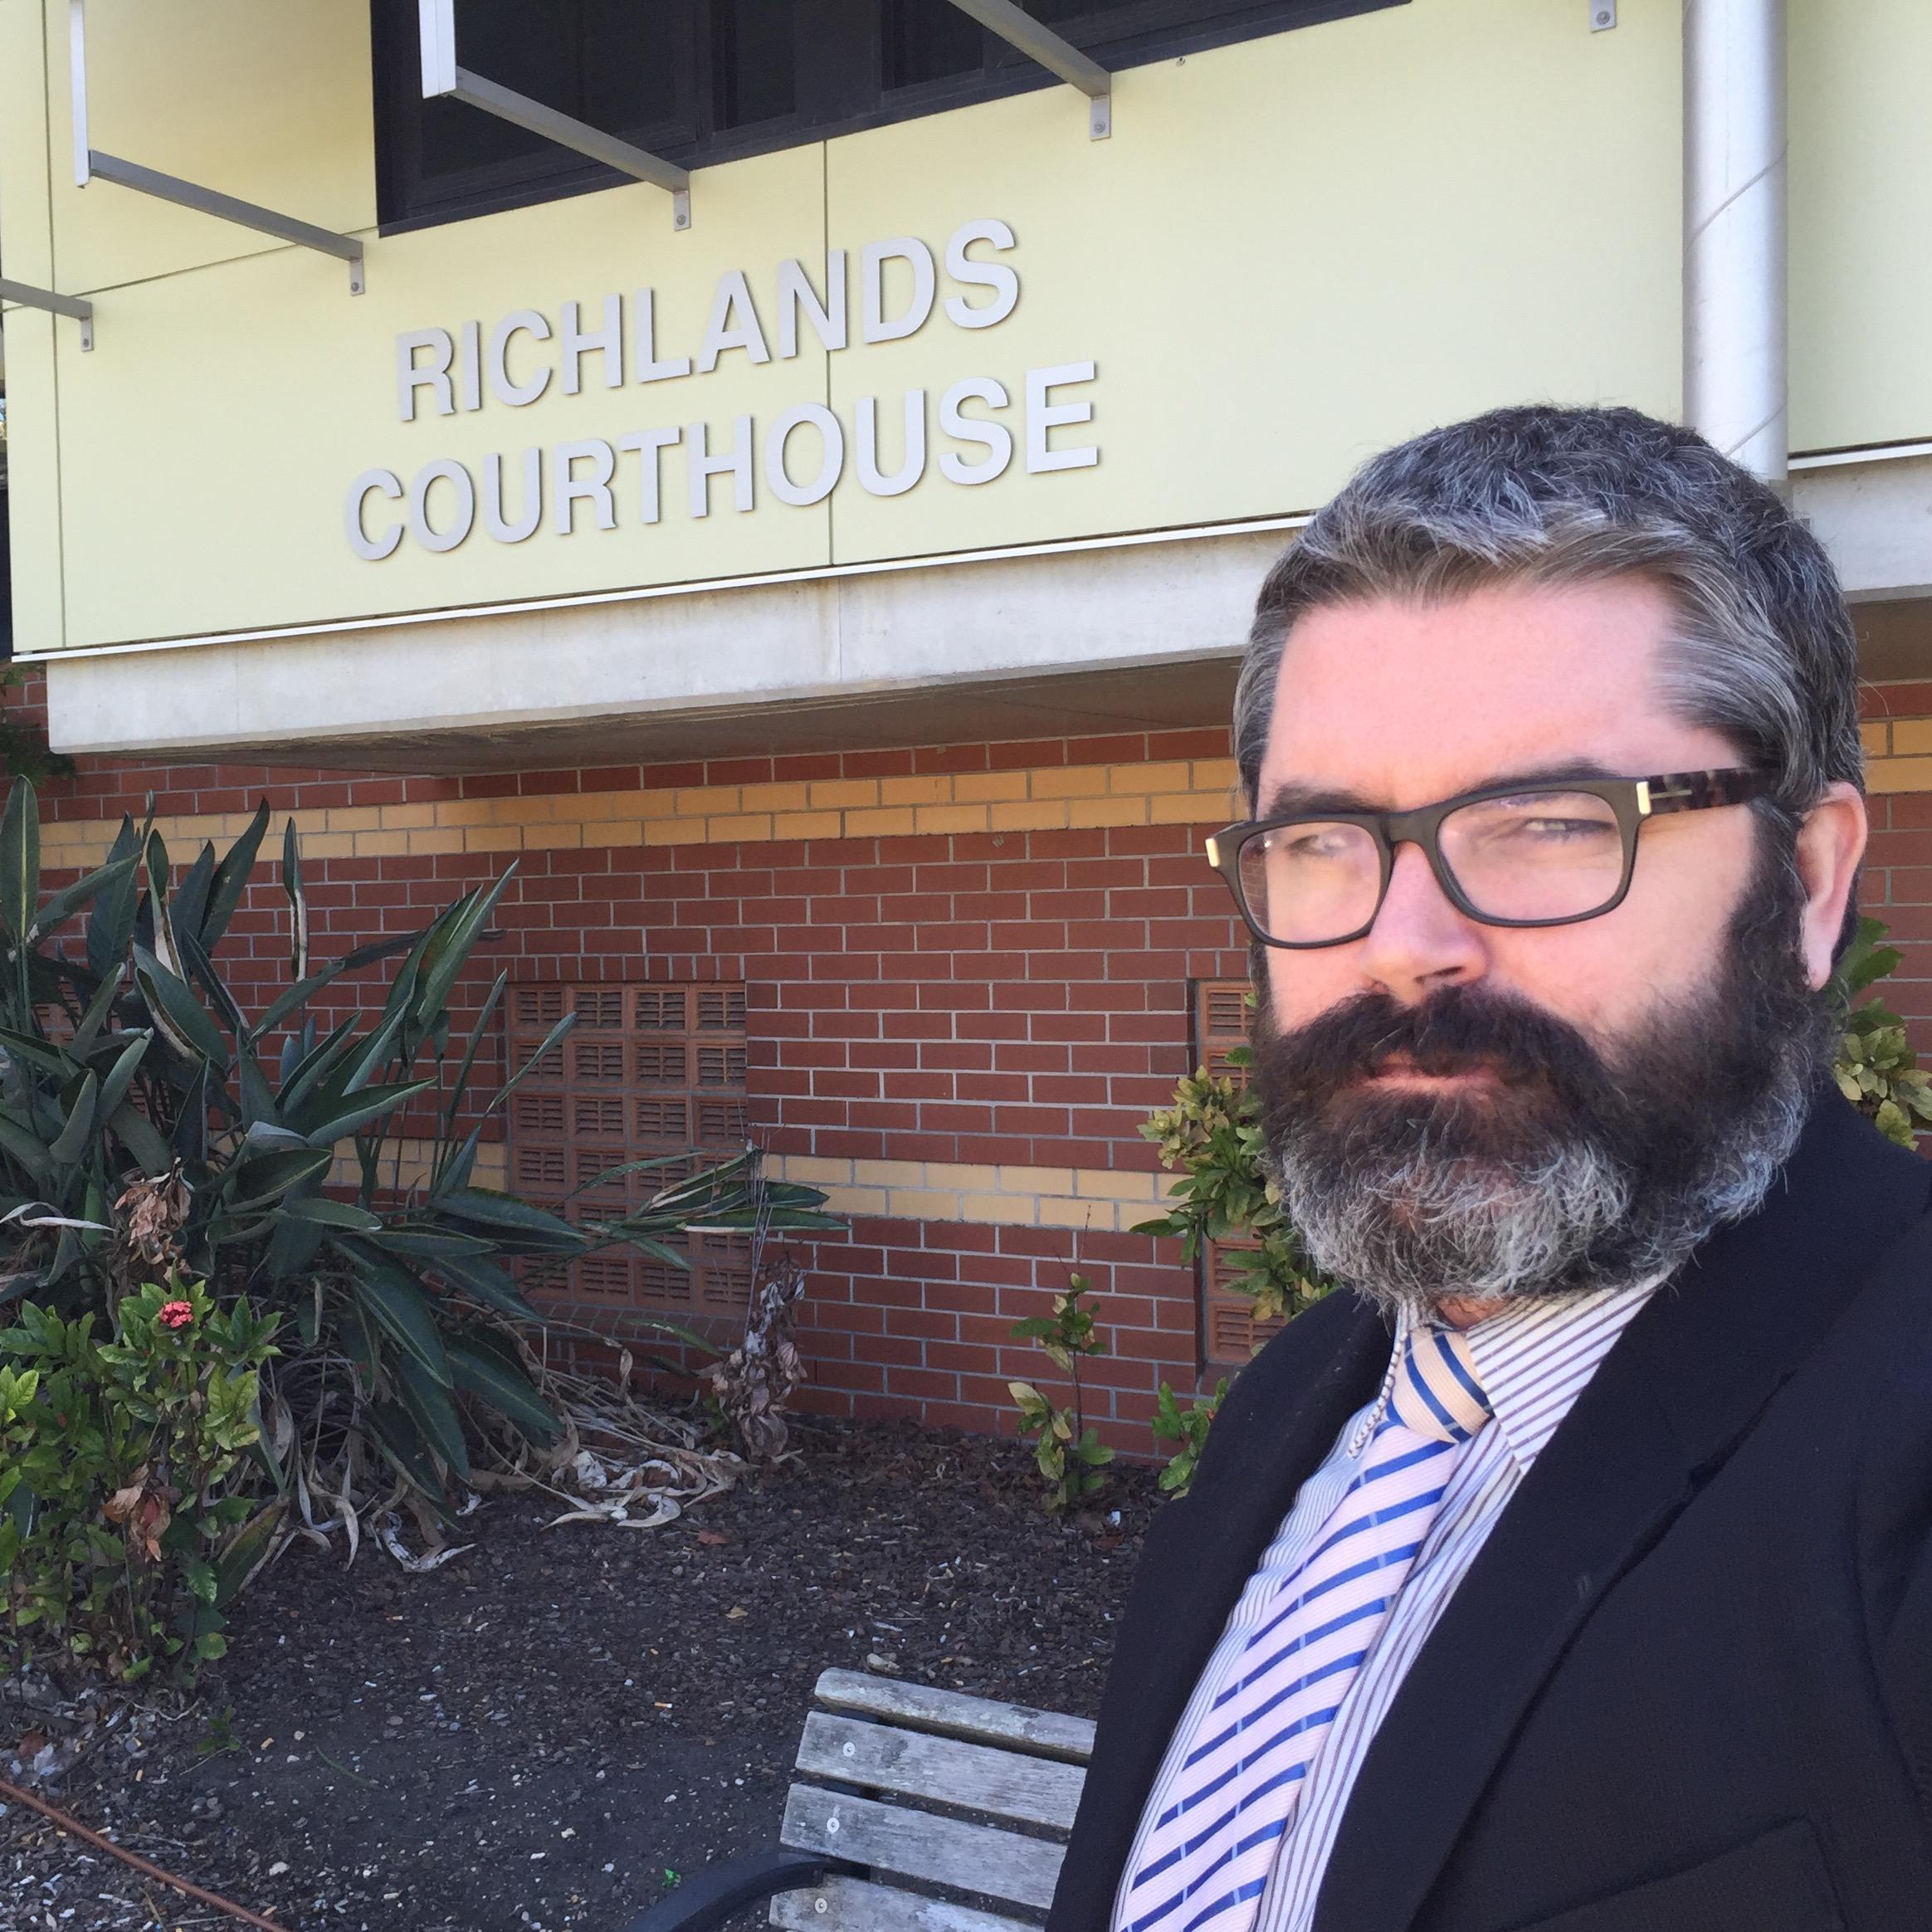 Richlands DUI Drink Driving Drug Driving Lawyer